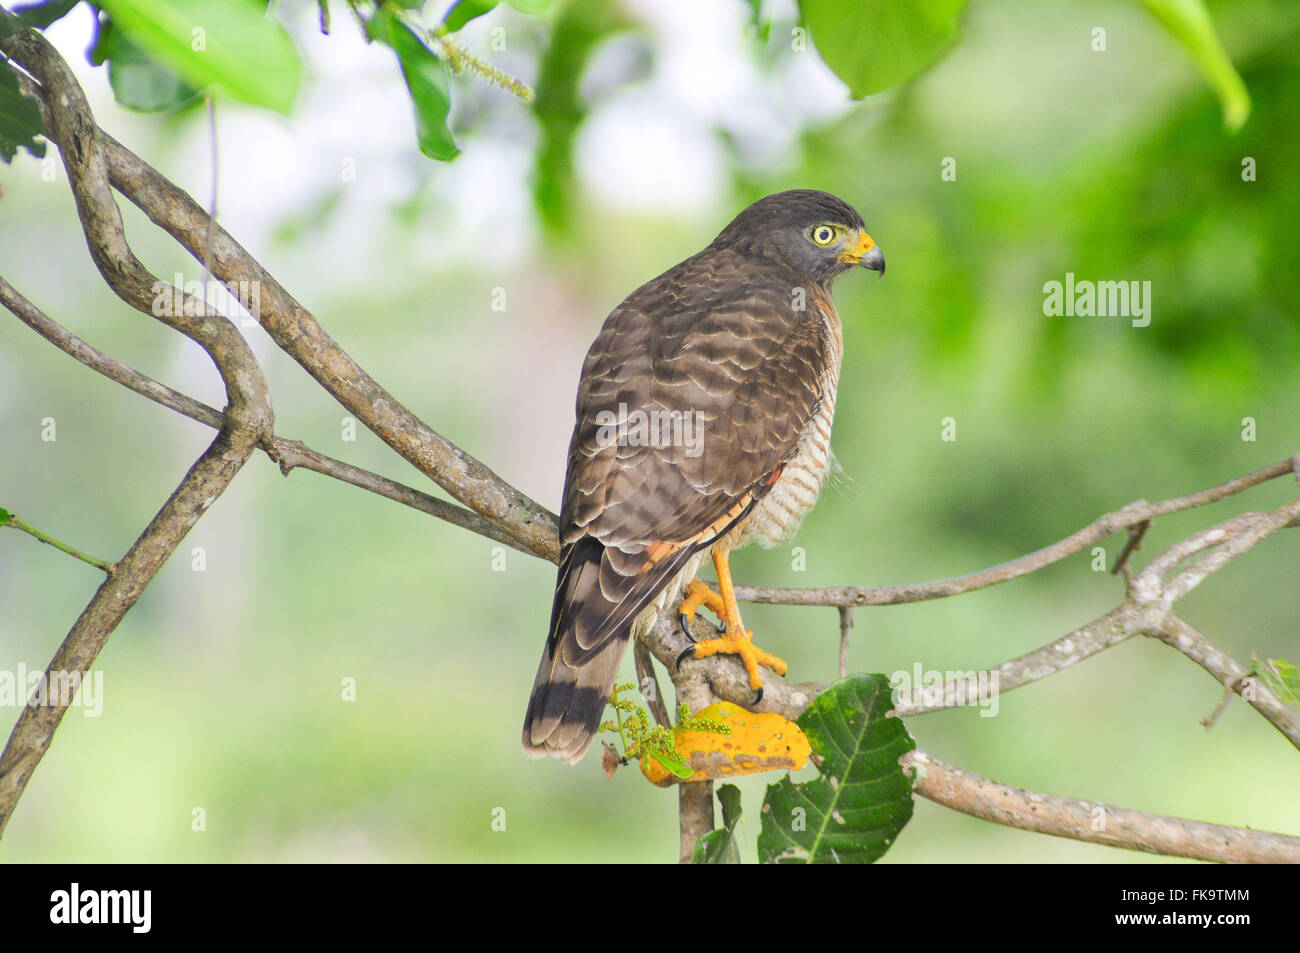 Am Straßenrand Falke thront auf Zweig Stockbild